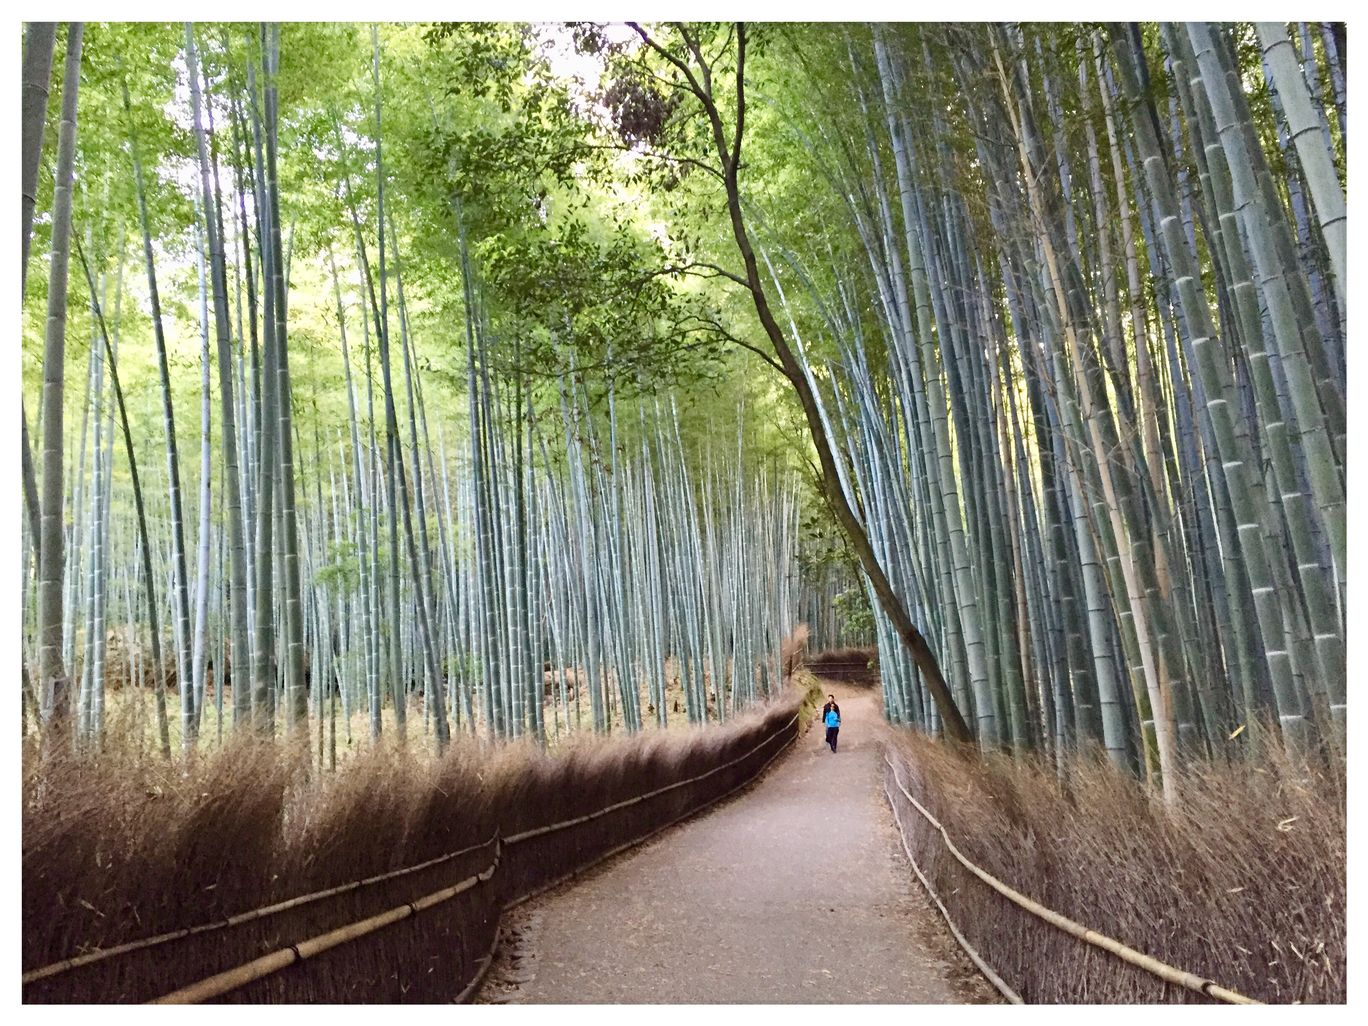 Photo of Arashiyama Bamboo Grove By Gauri Sekaria